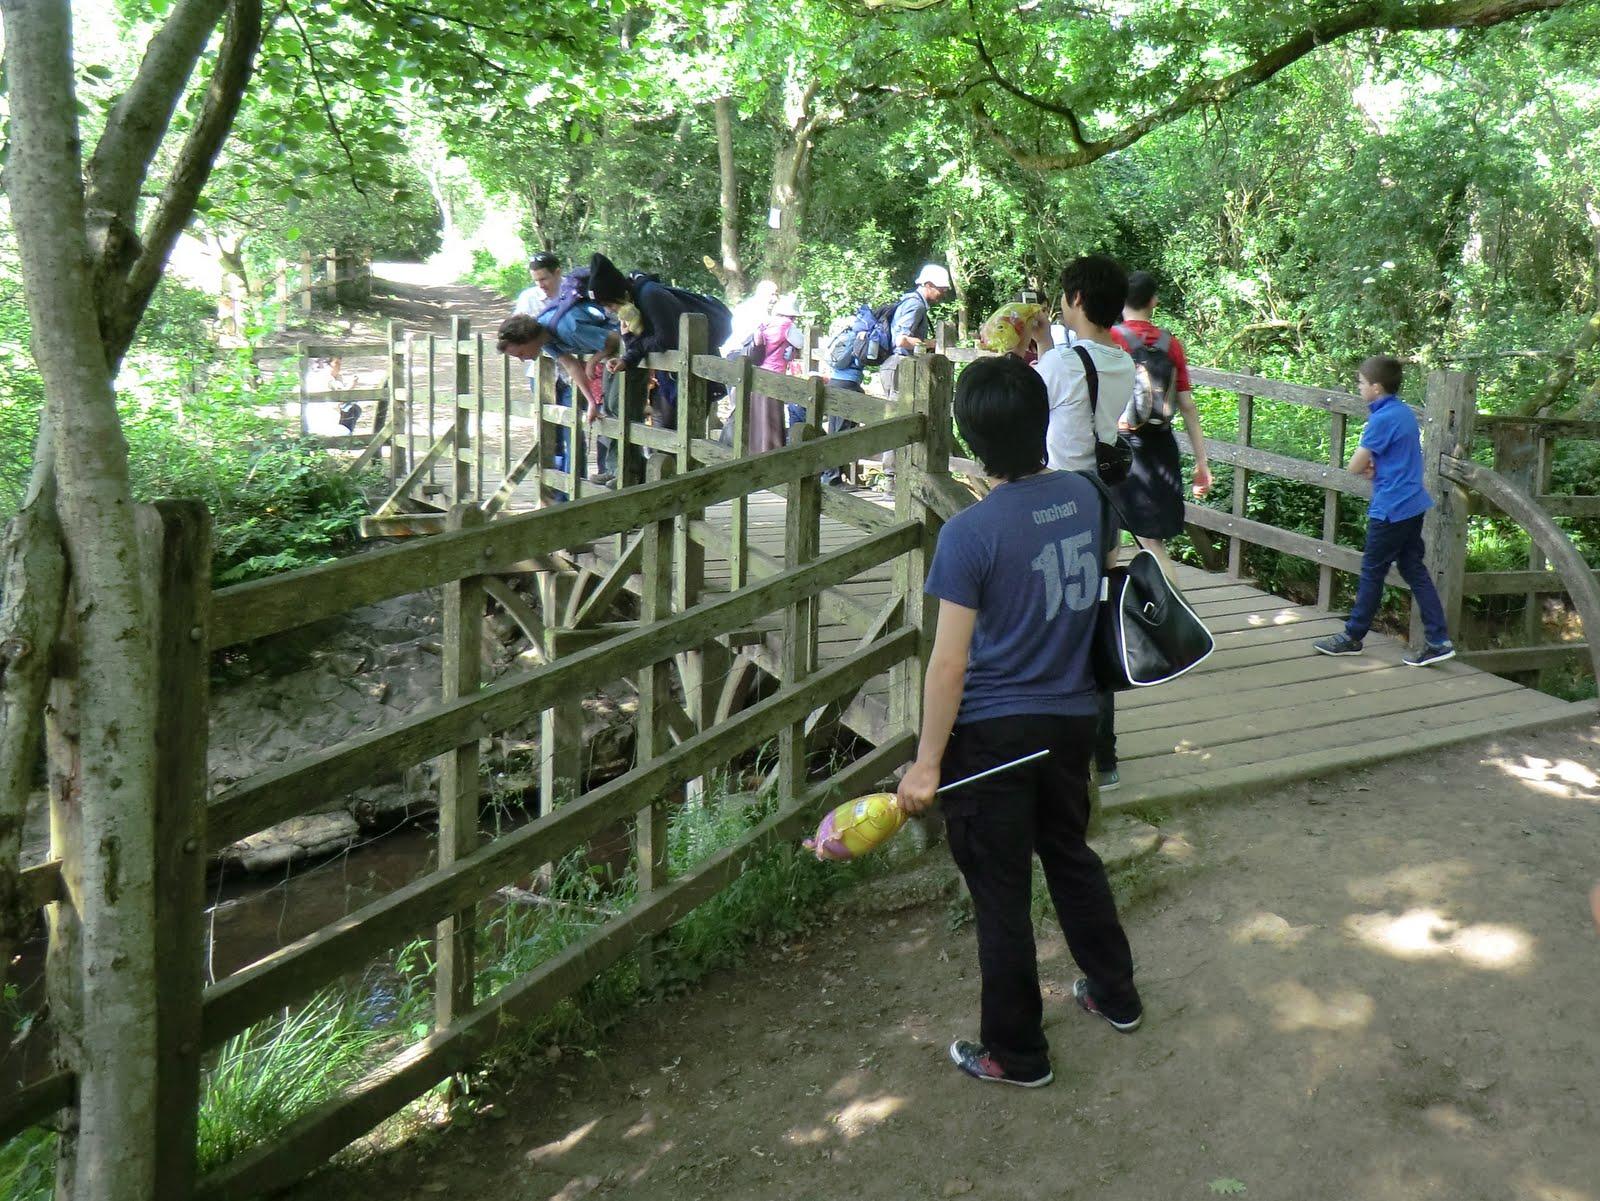 CIMG7324 Pooh Bridge, Ashdown Forest